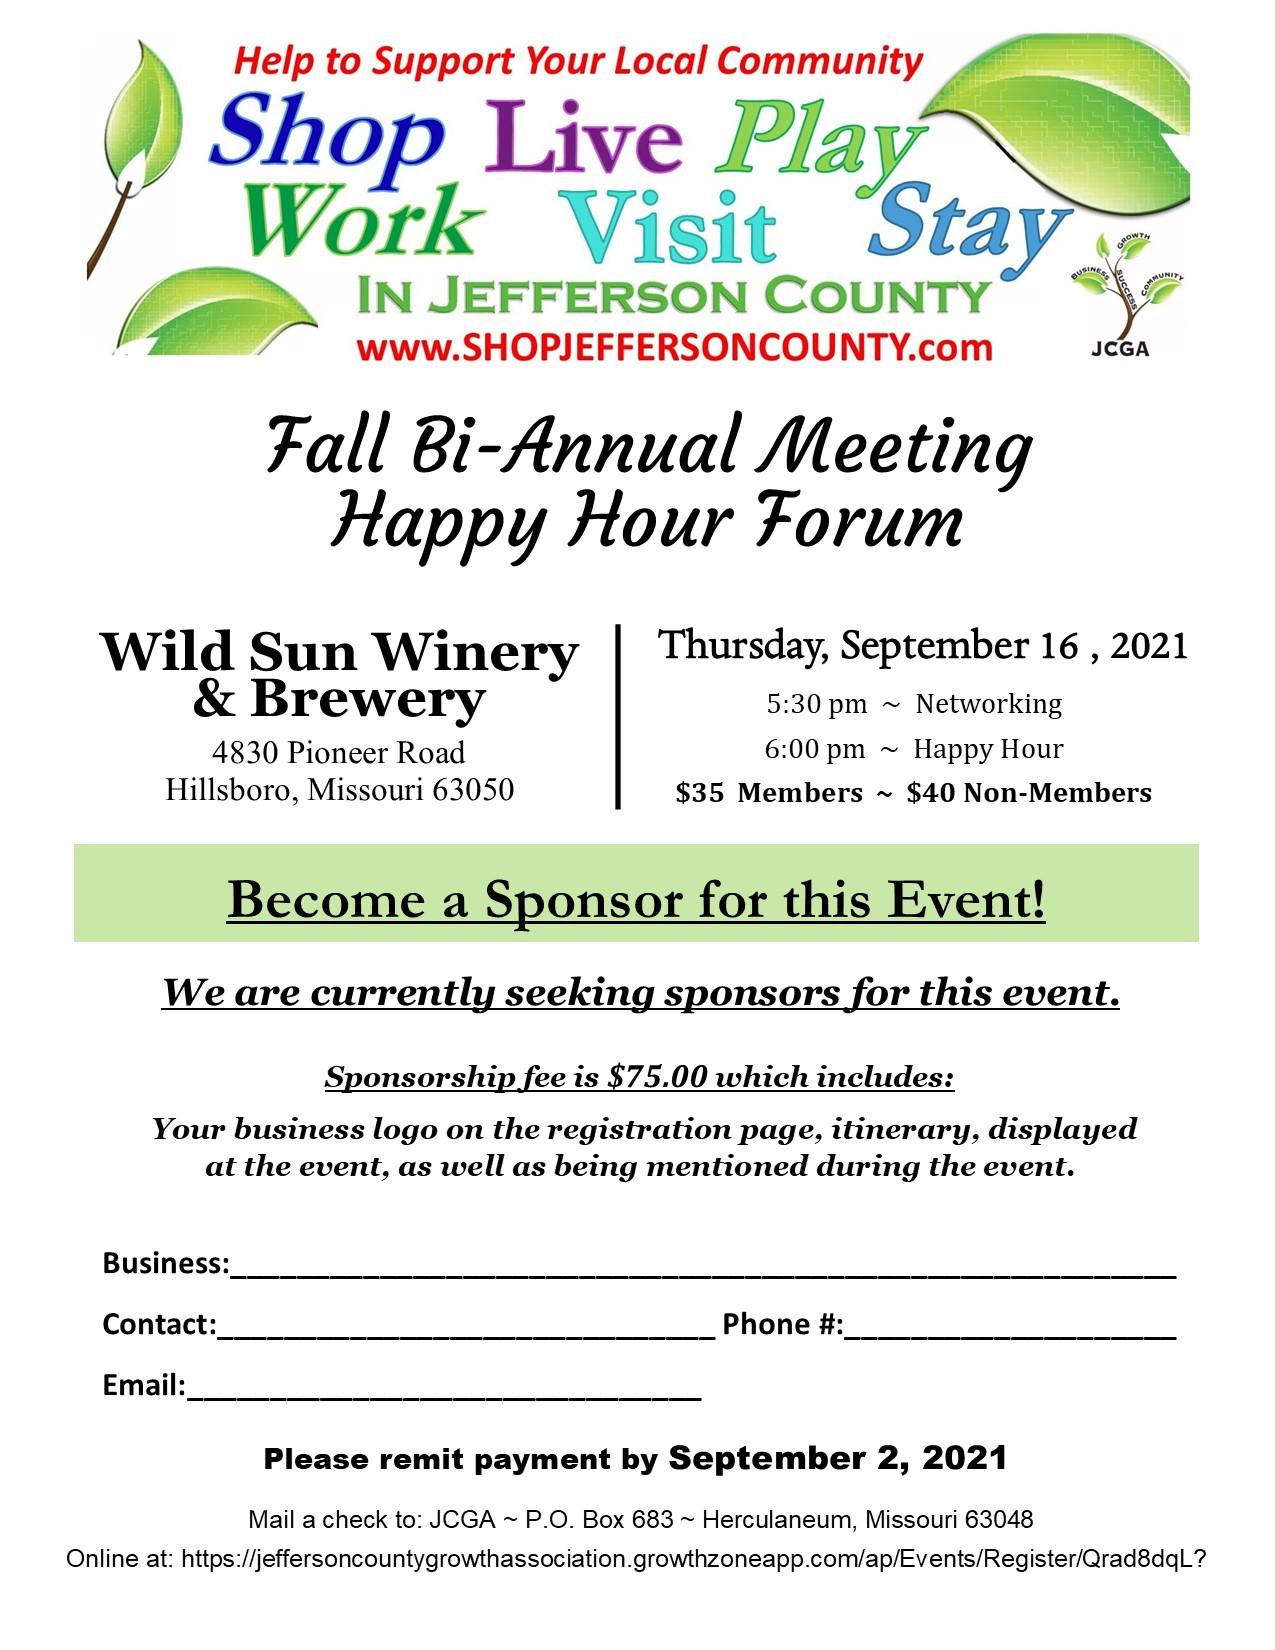 Sponsorship Opportunity - Fall Bi-Annual 2021